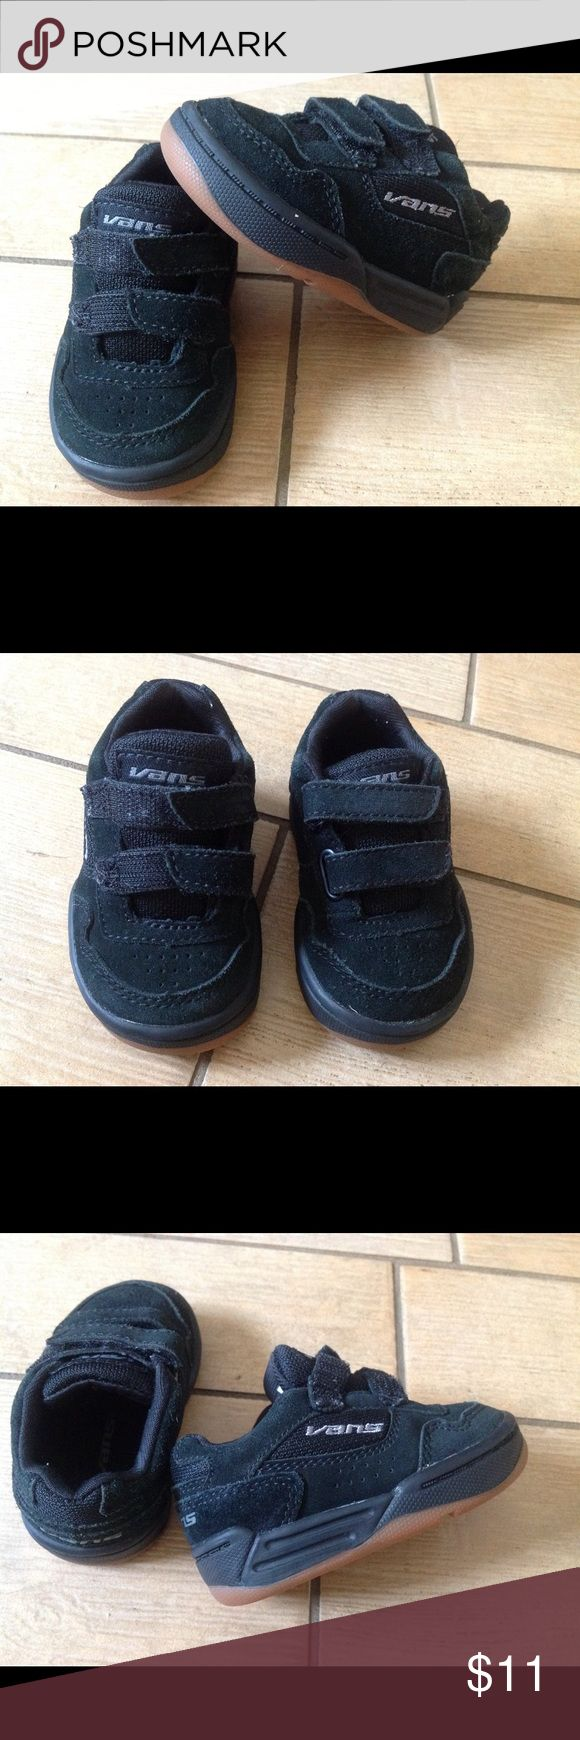 Vans Suede Baby Toddler Old Skool Black suede, Velcro fasteners, 'Chavez V' Core Skate Shoes made just like the grown ups! Vans Shoes Baby & Walker